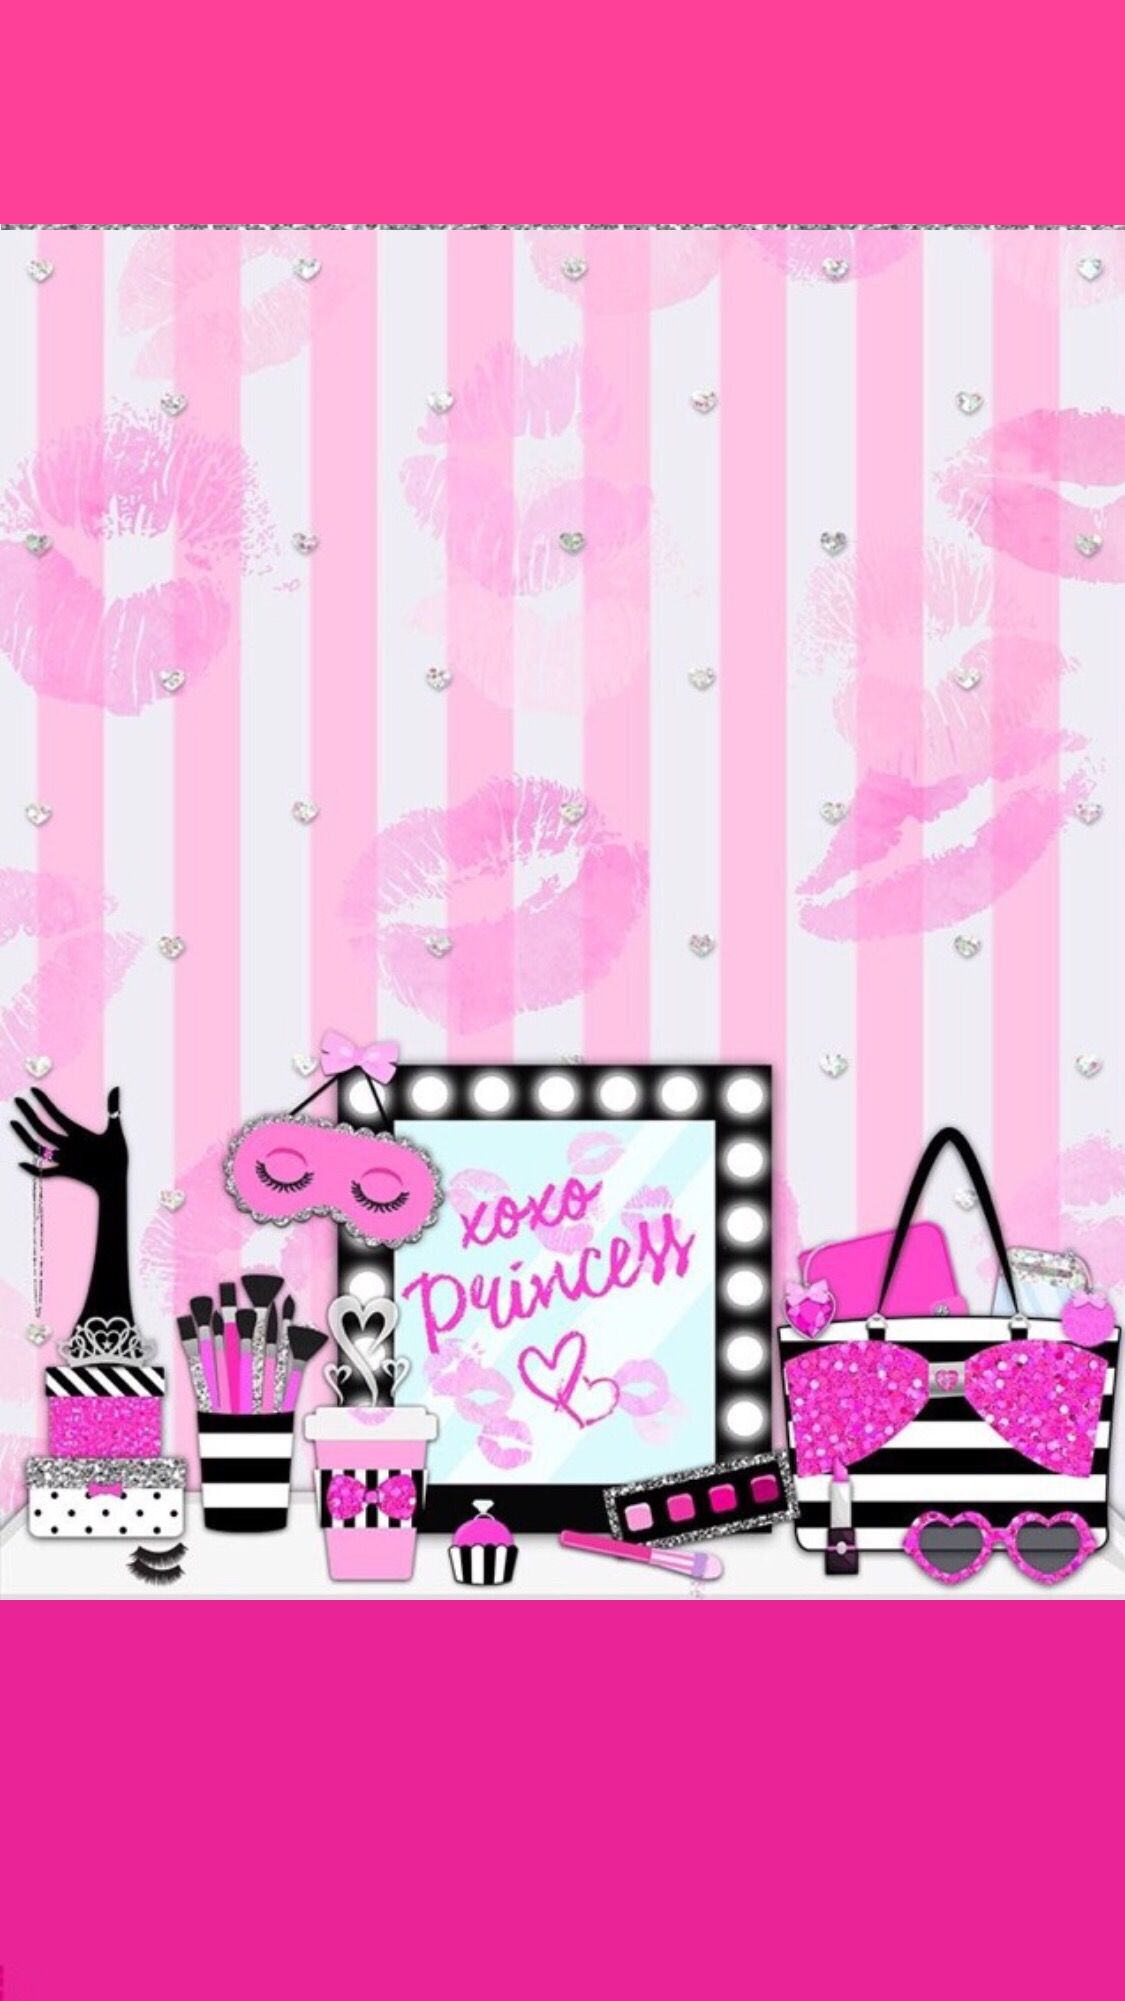 Popular Wallpaper Hello Kitty Design - 864a8139d73d7e78fae44f37357140ea  Image_539094.jpg